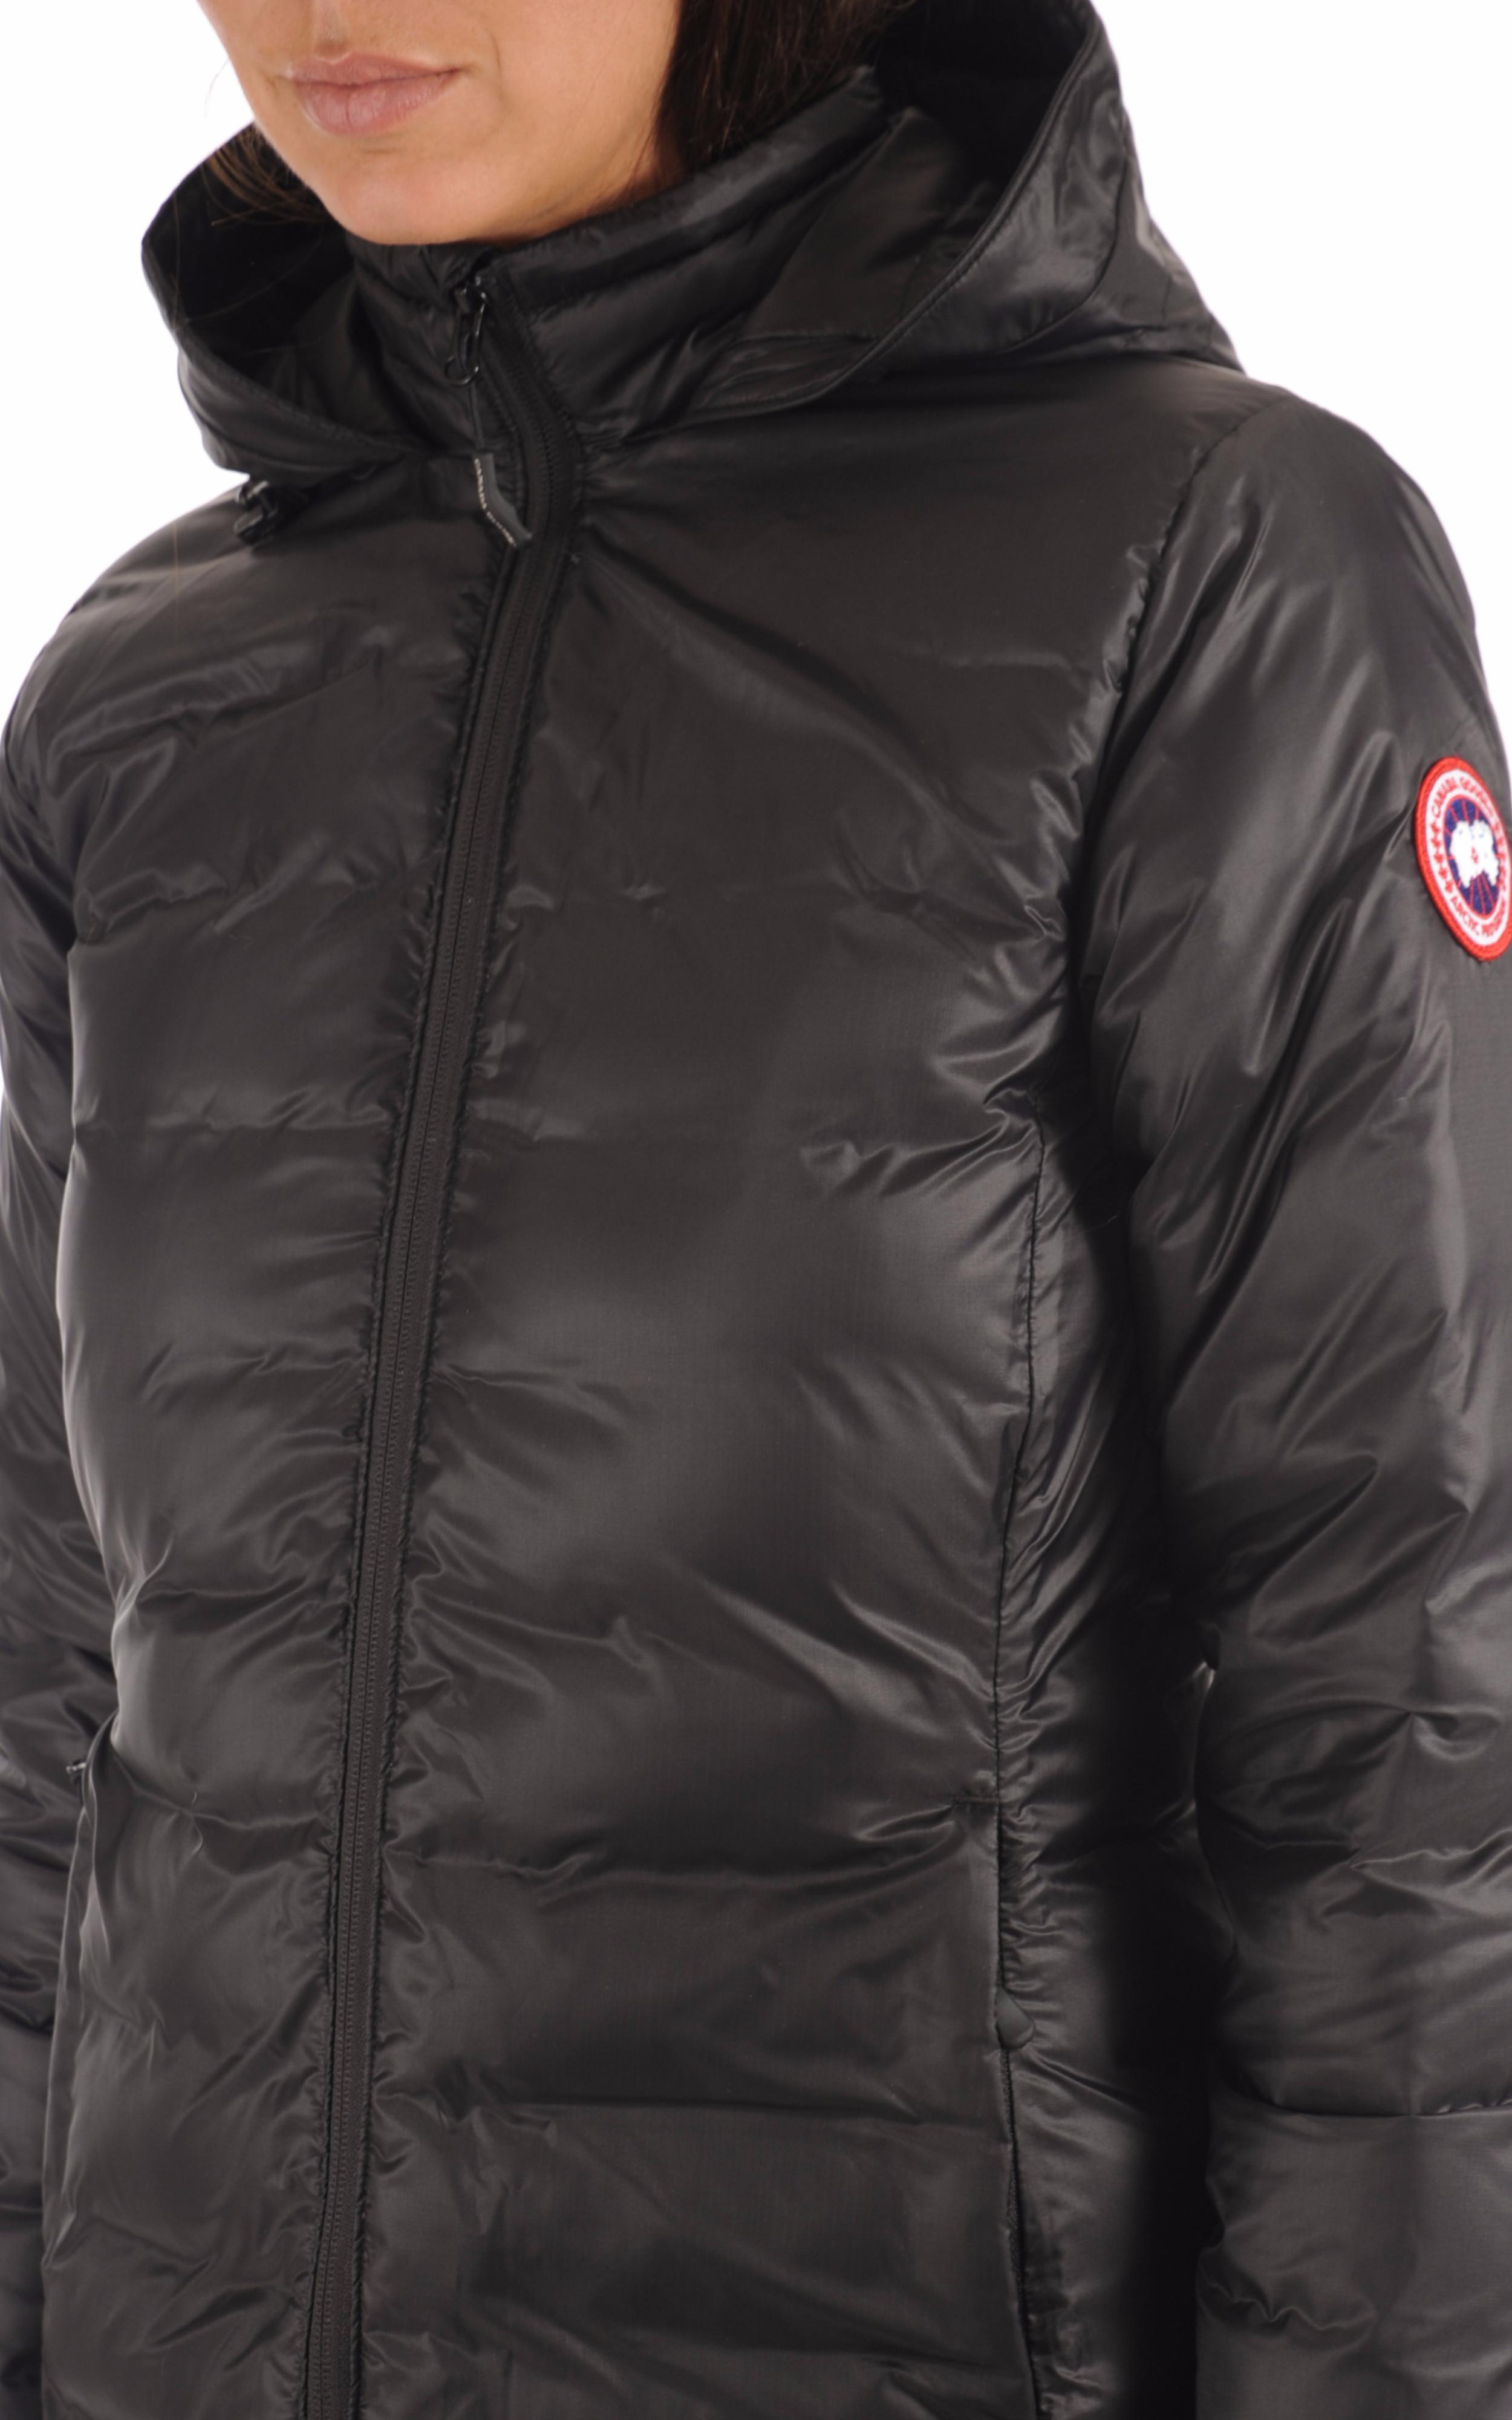 Parka Camp Hooded Jacket Noire Canada Goose